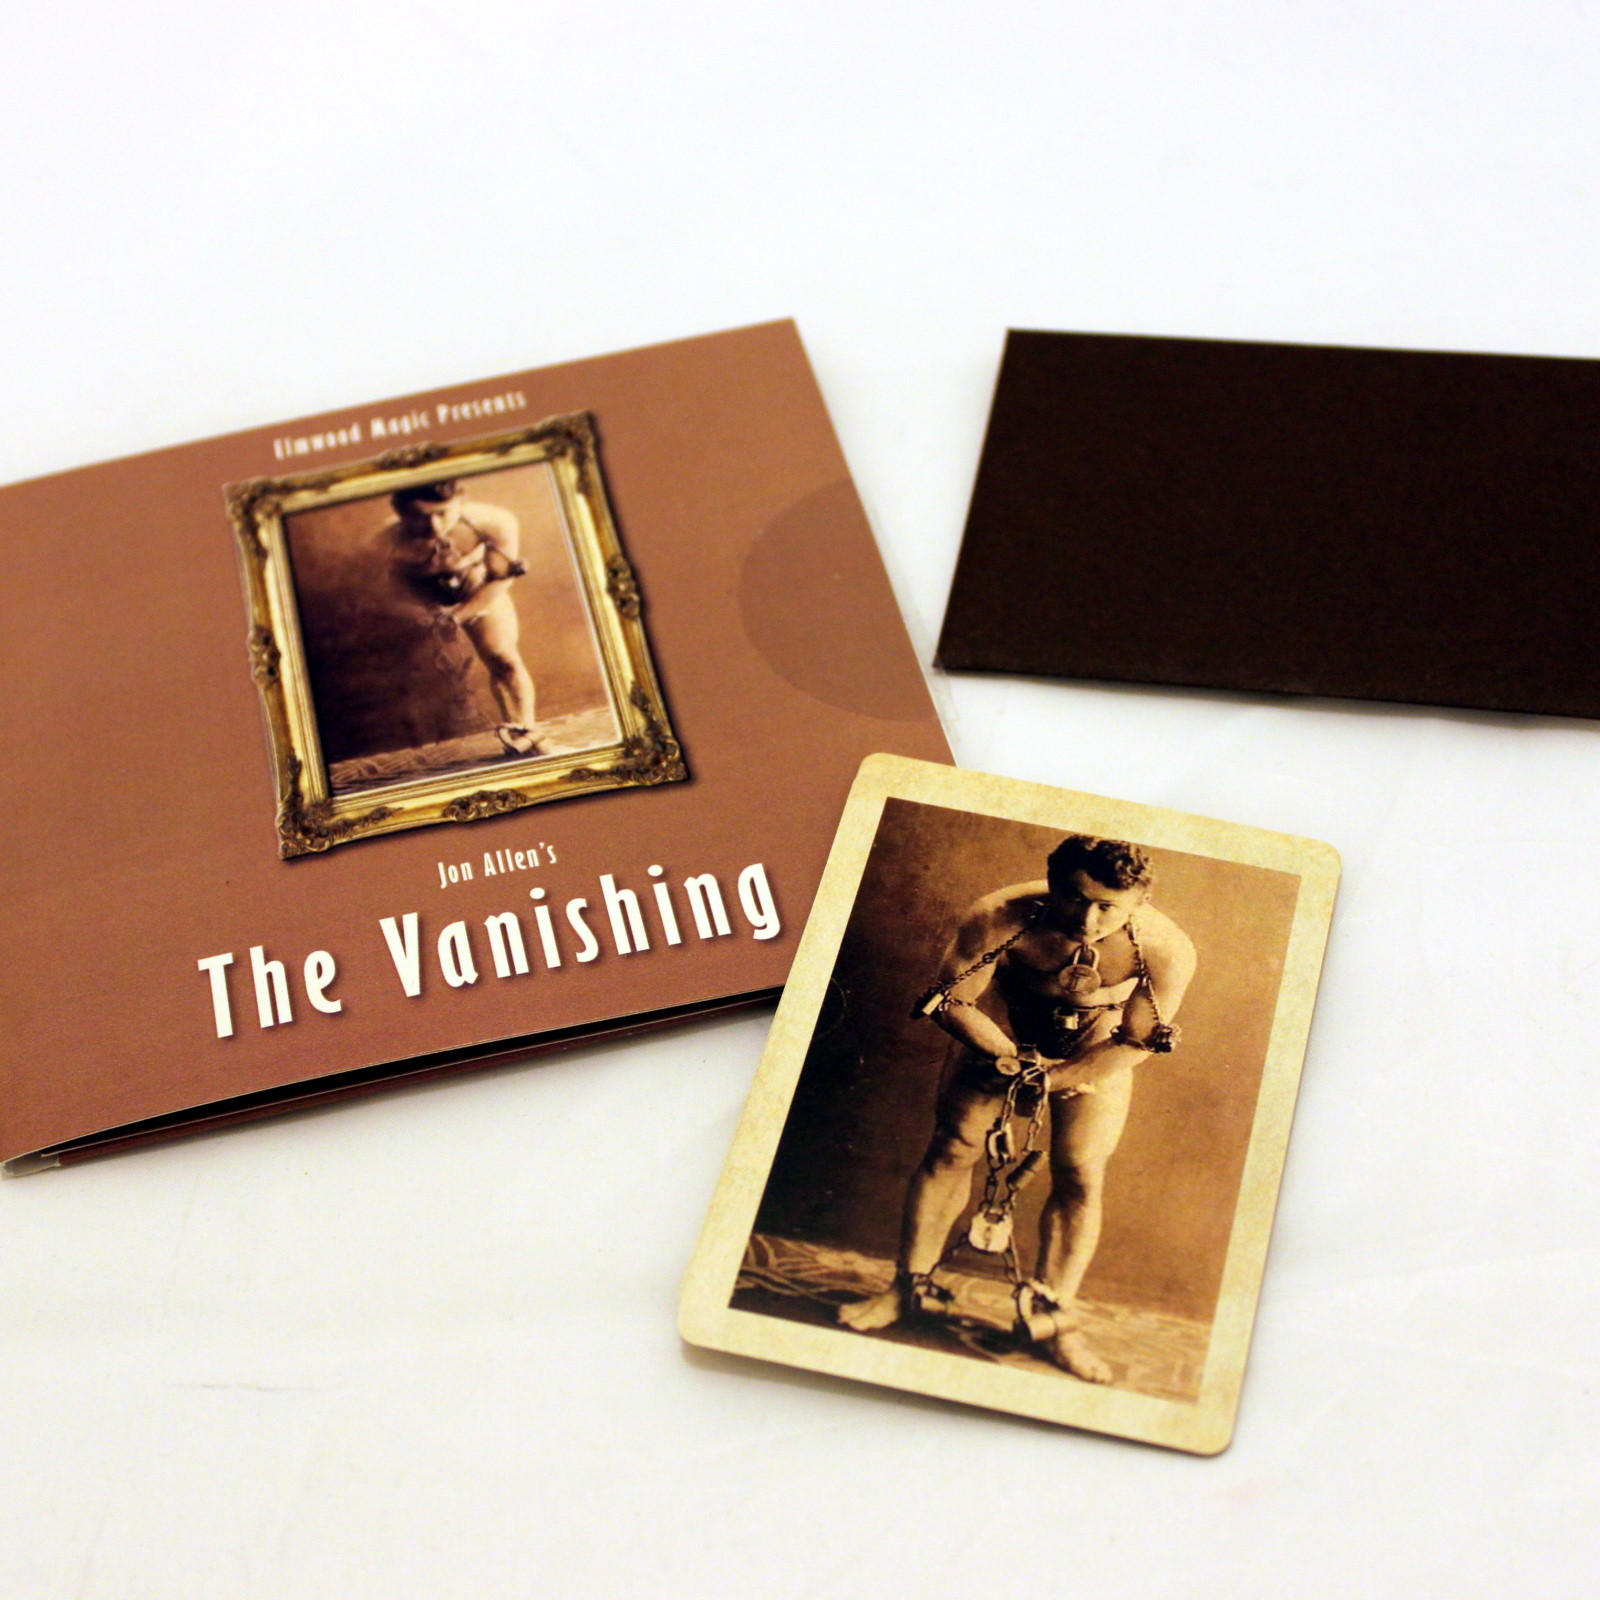 Vanishing, The by Jon Allen